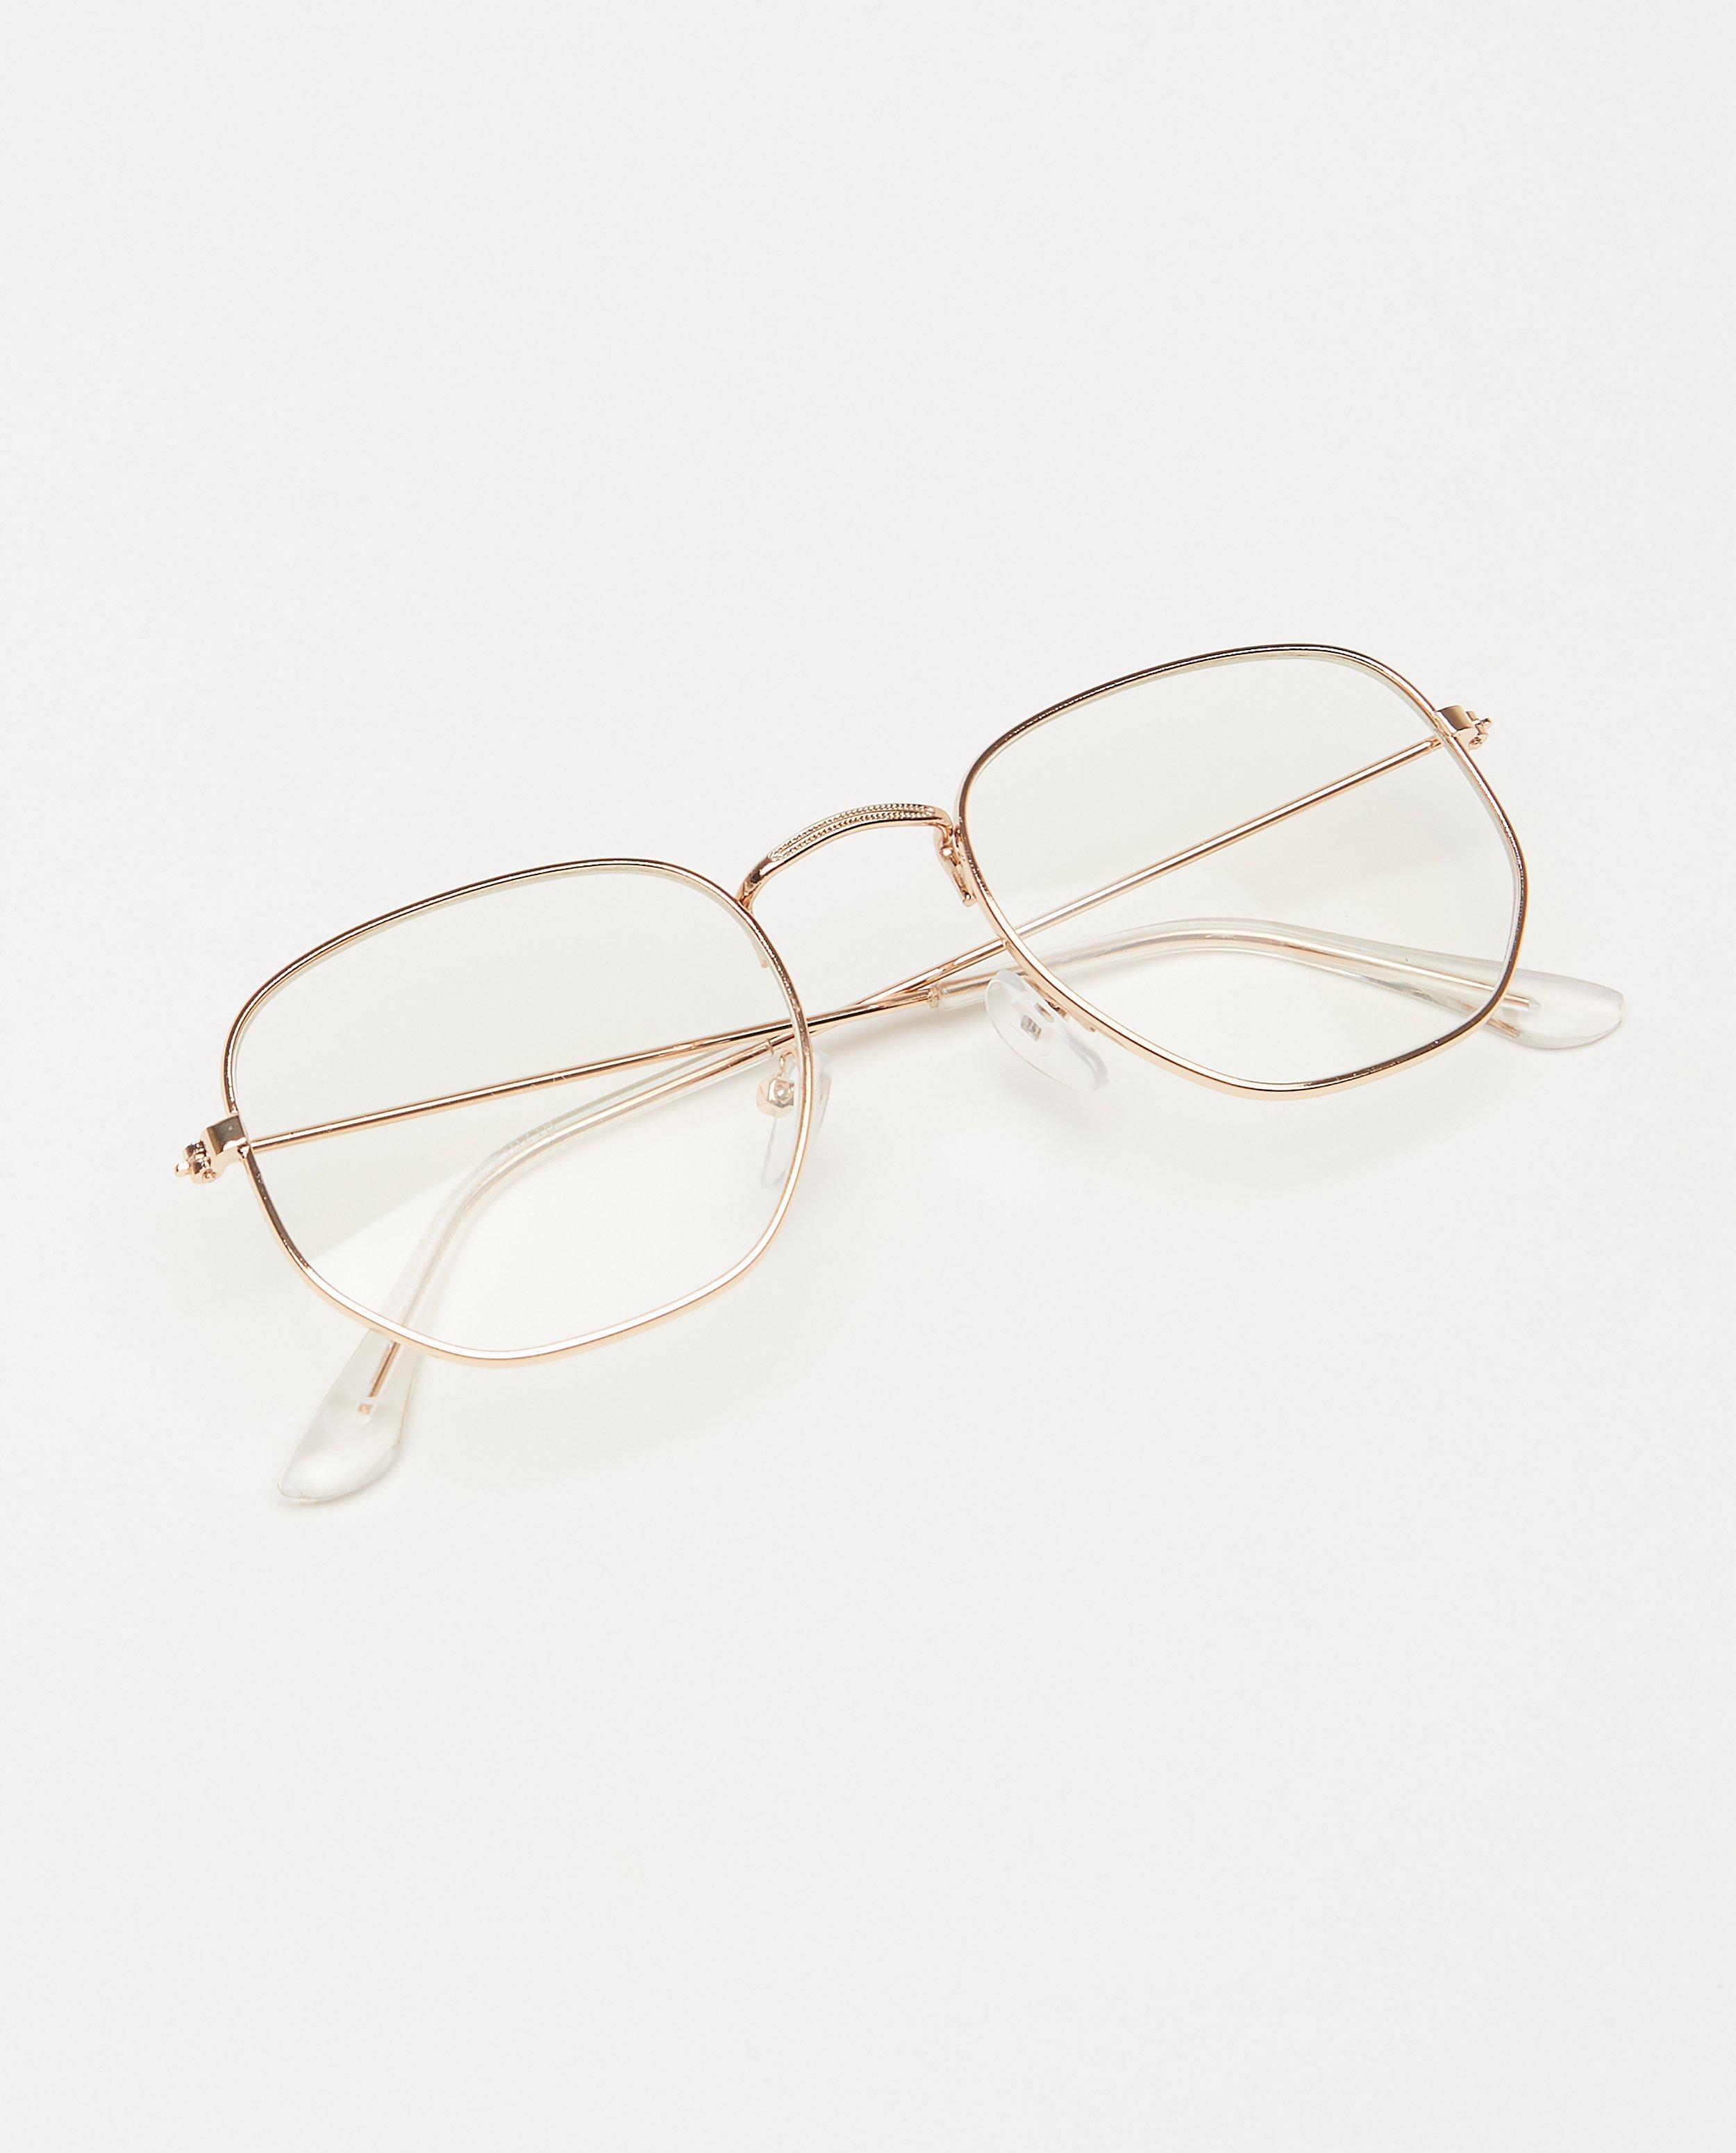 Zonnebrillen - Hoekige #LikeMe-bril